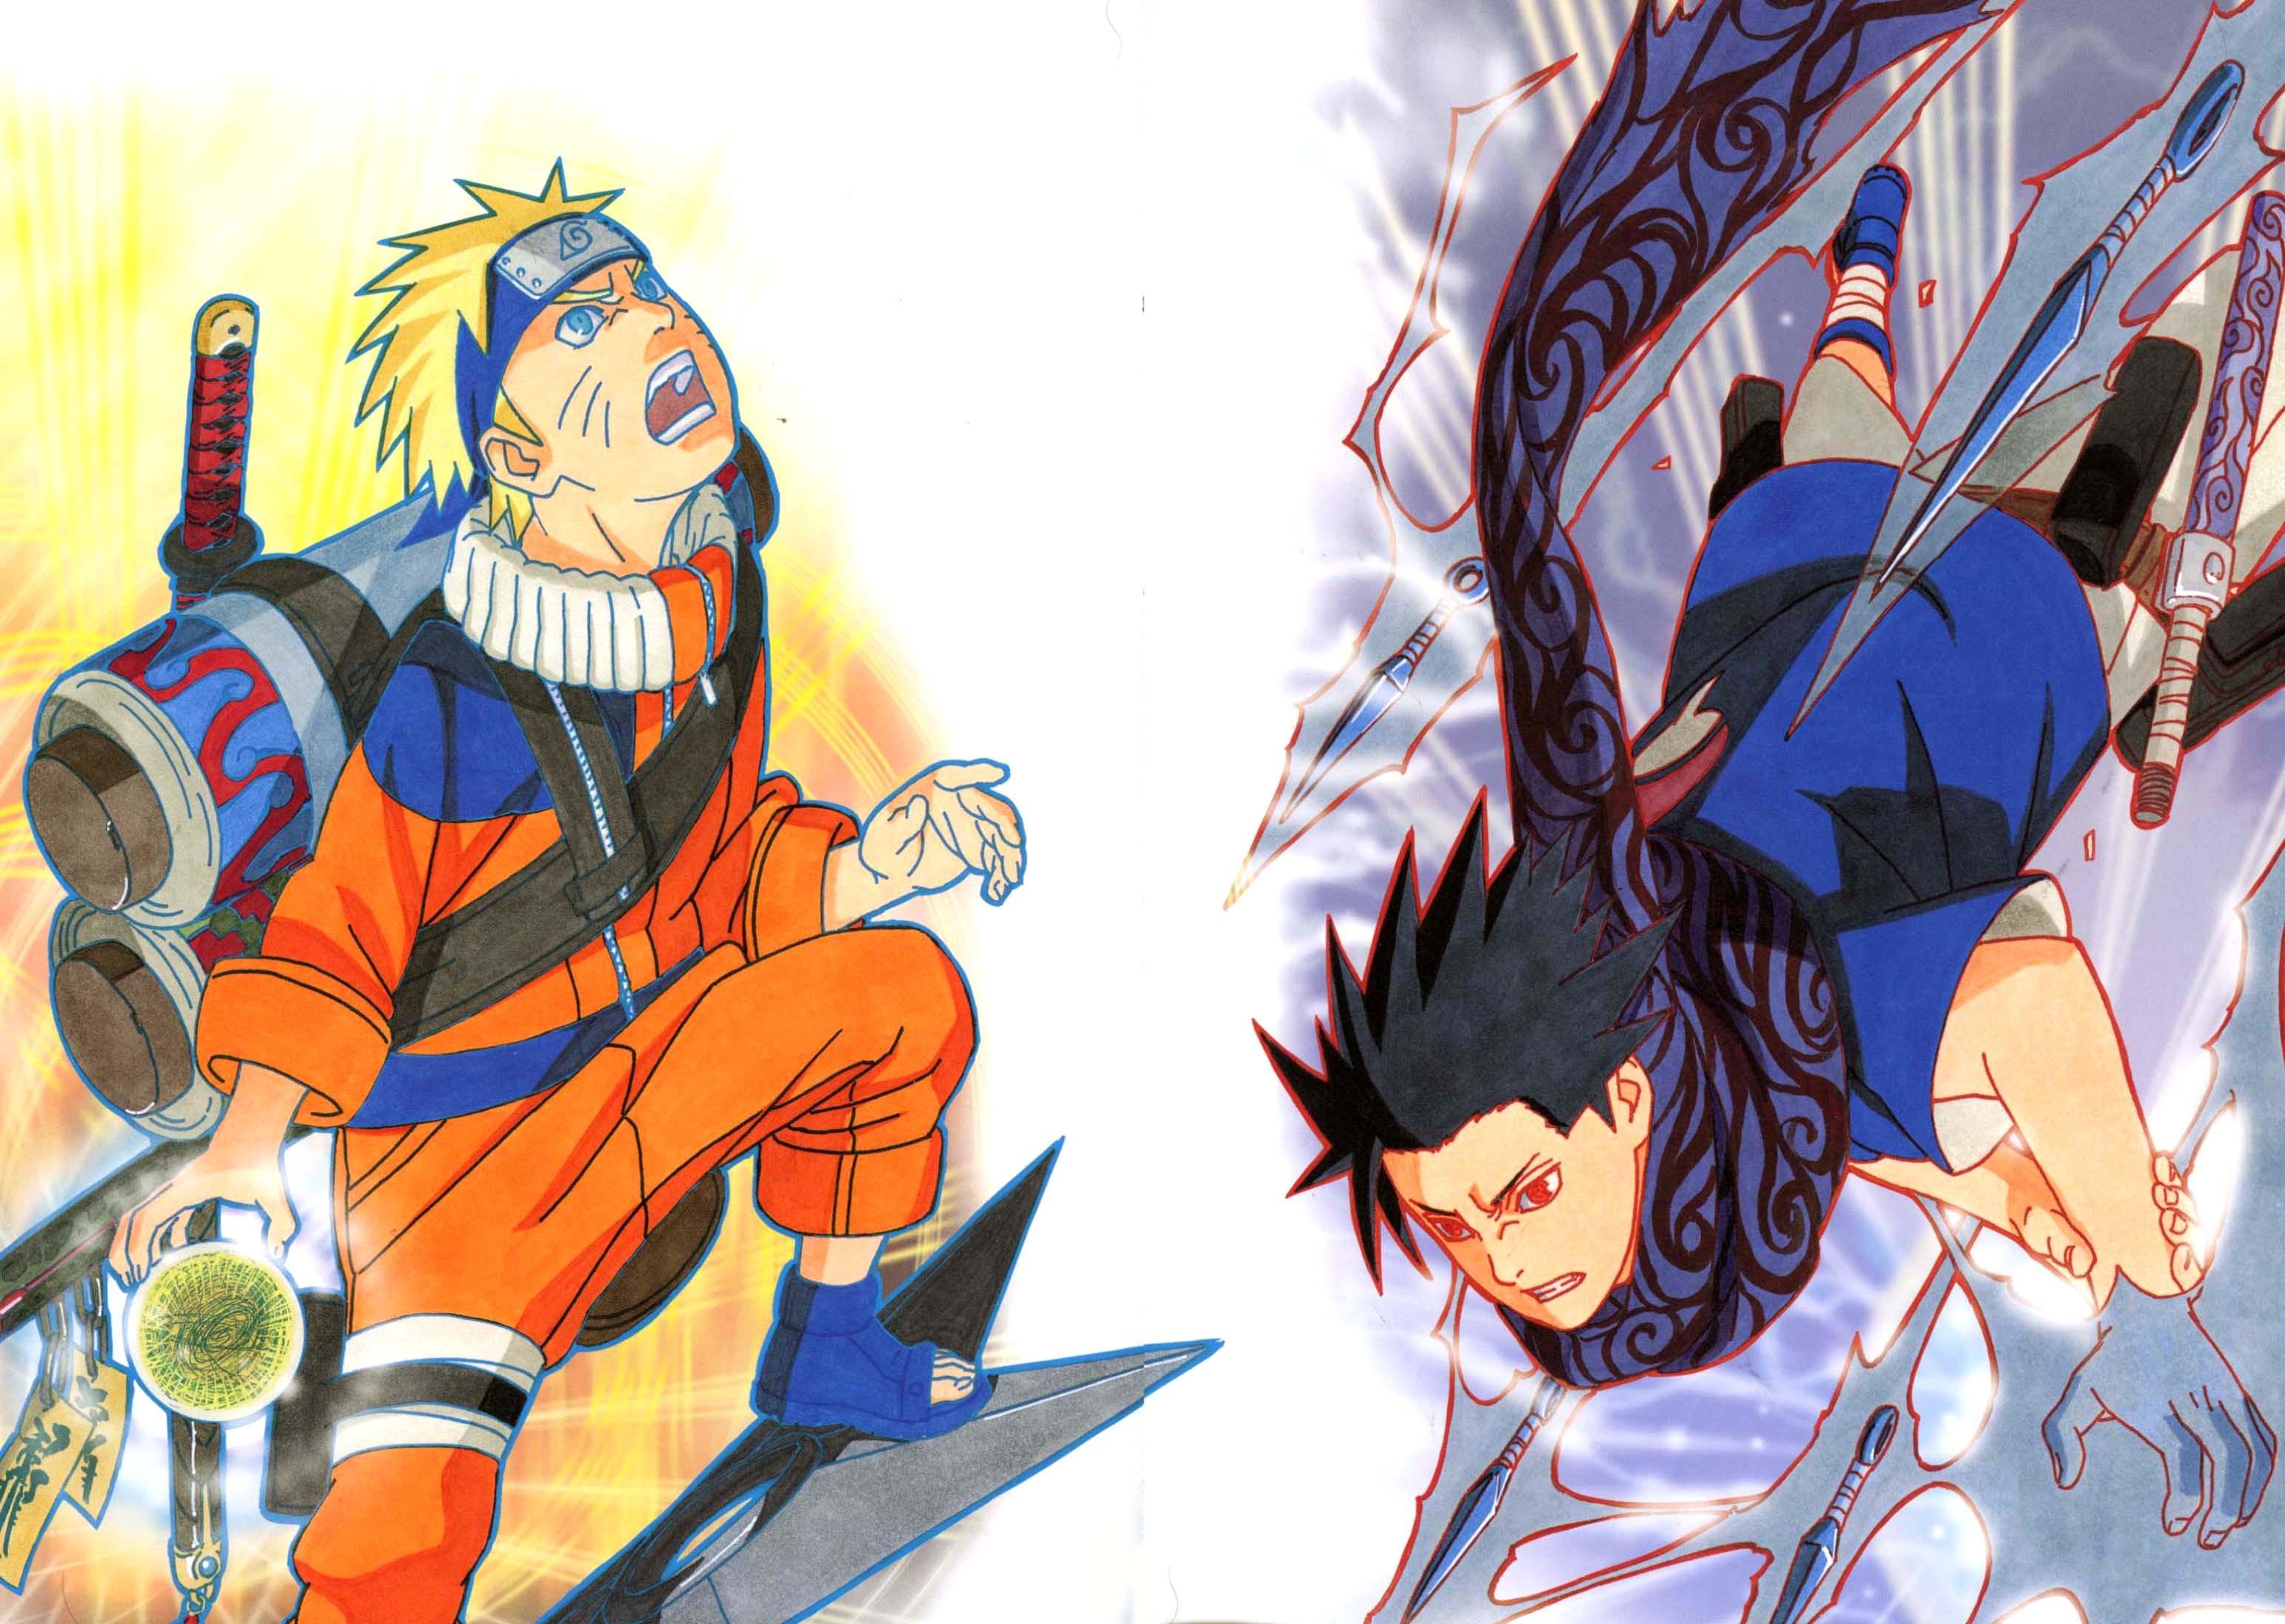 Naruto Wallpaper Naruto Wallpaper Naruto Wallpaper Naruto Wallpaper